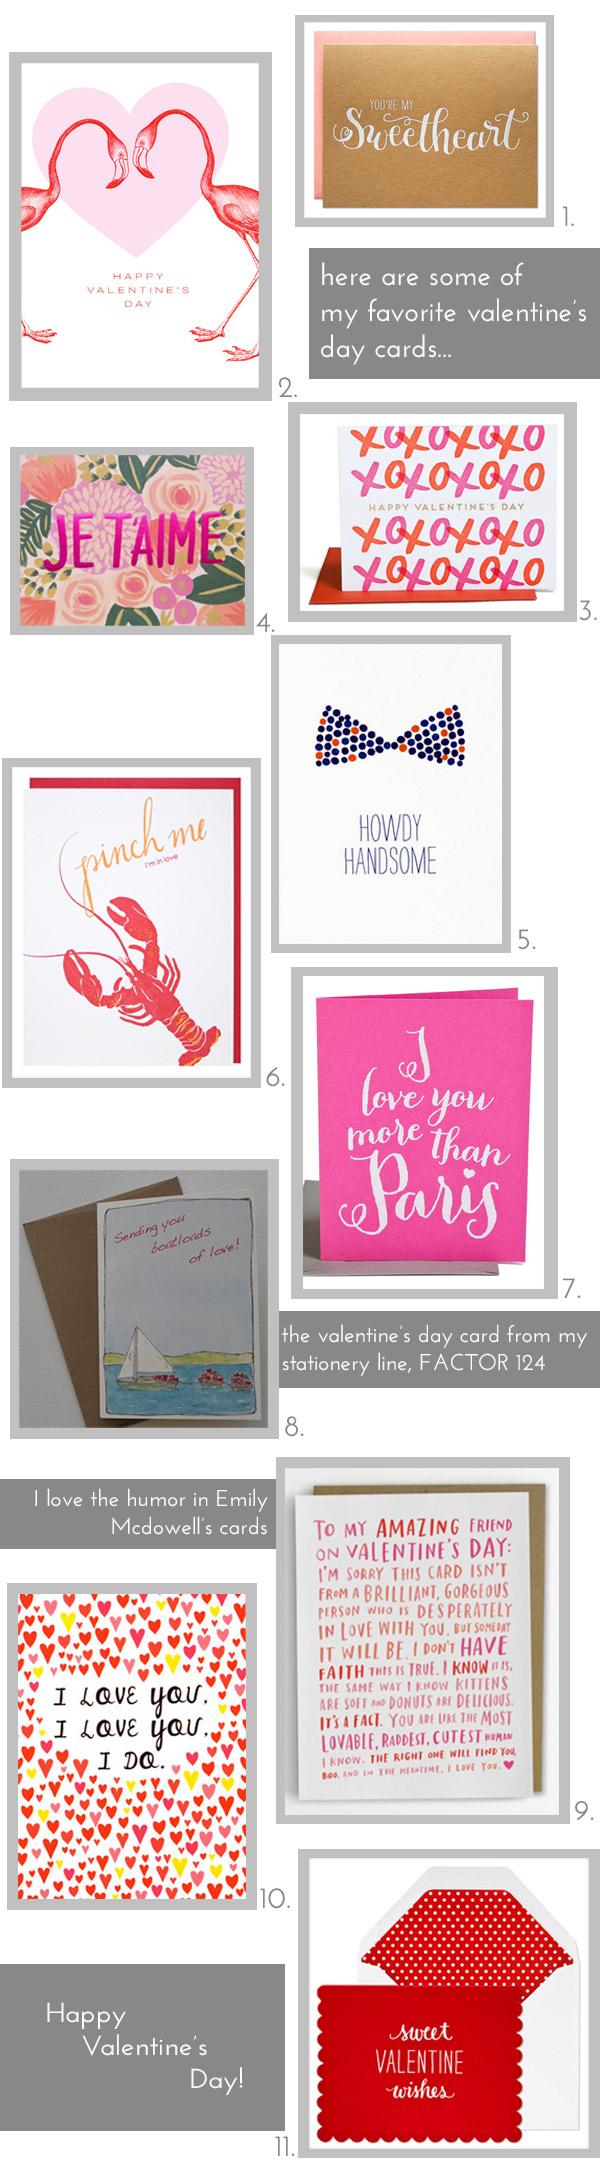 2.7-valentines-cards